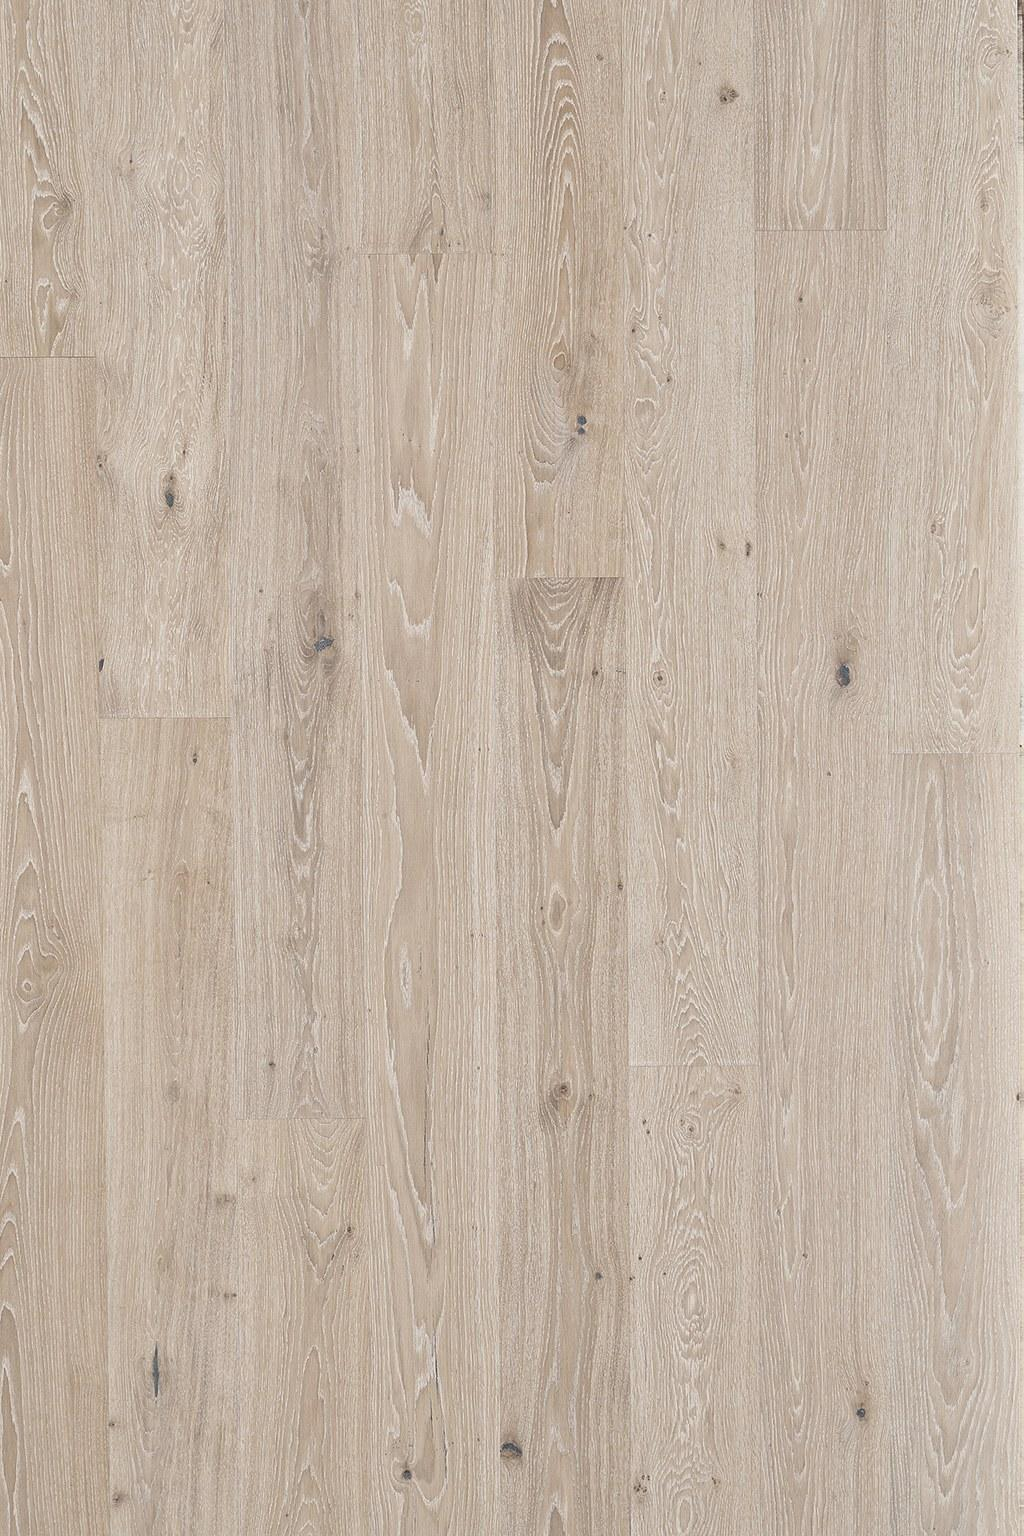 Timberwise Parketti Lankkuparketti Puulattia Wooden Floor Parquet Plank Tammi Oak Vintage Arctic 2D1